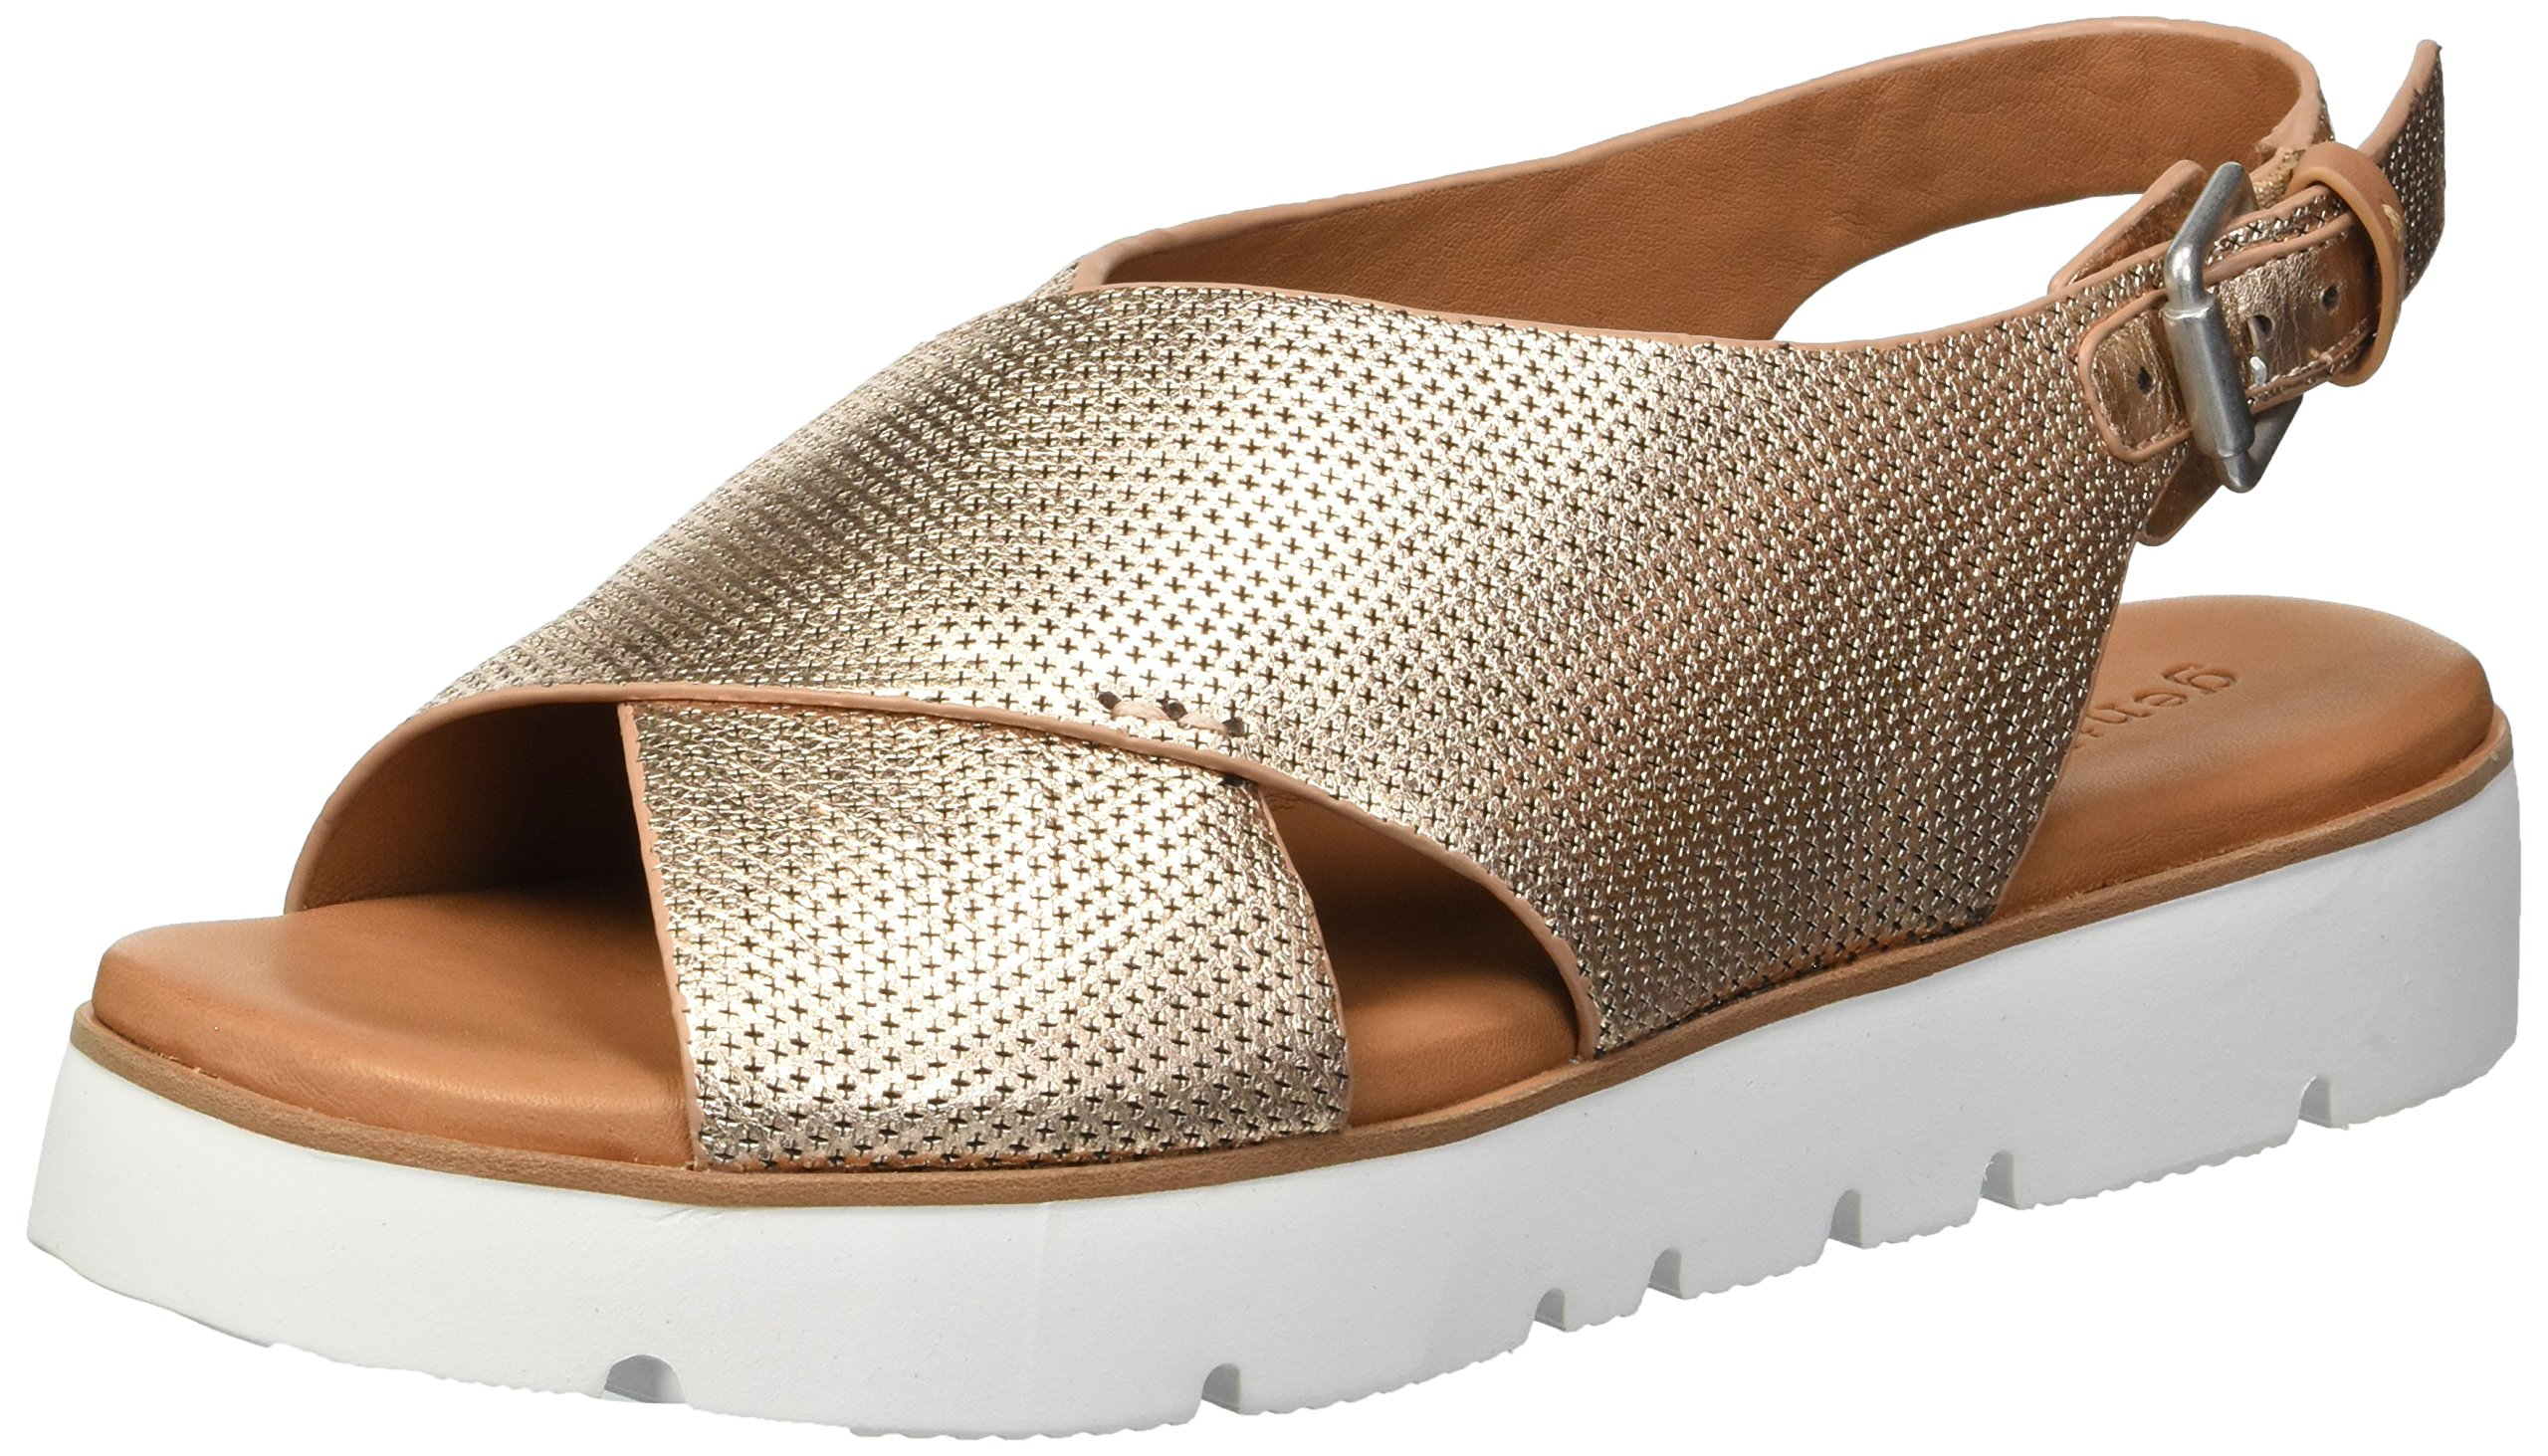 50f7ab3332ca Galleon - Gentle Souls By Kenneth Cole Women s Kiki Platform Slingback Sandal  Sandal